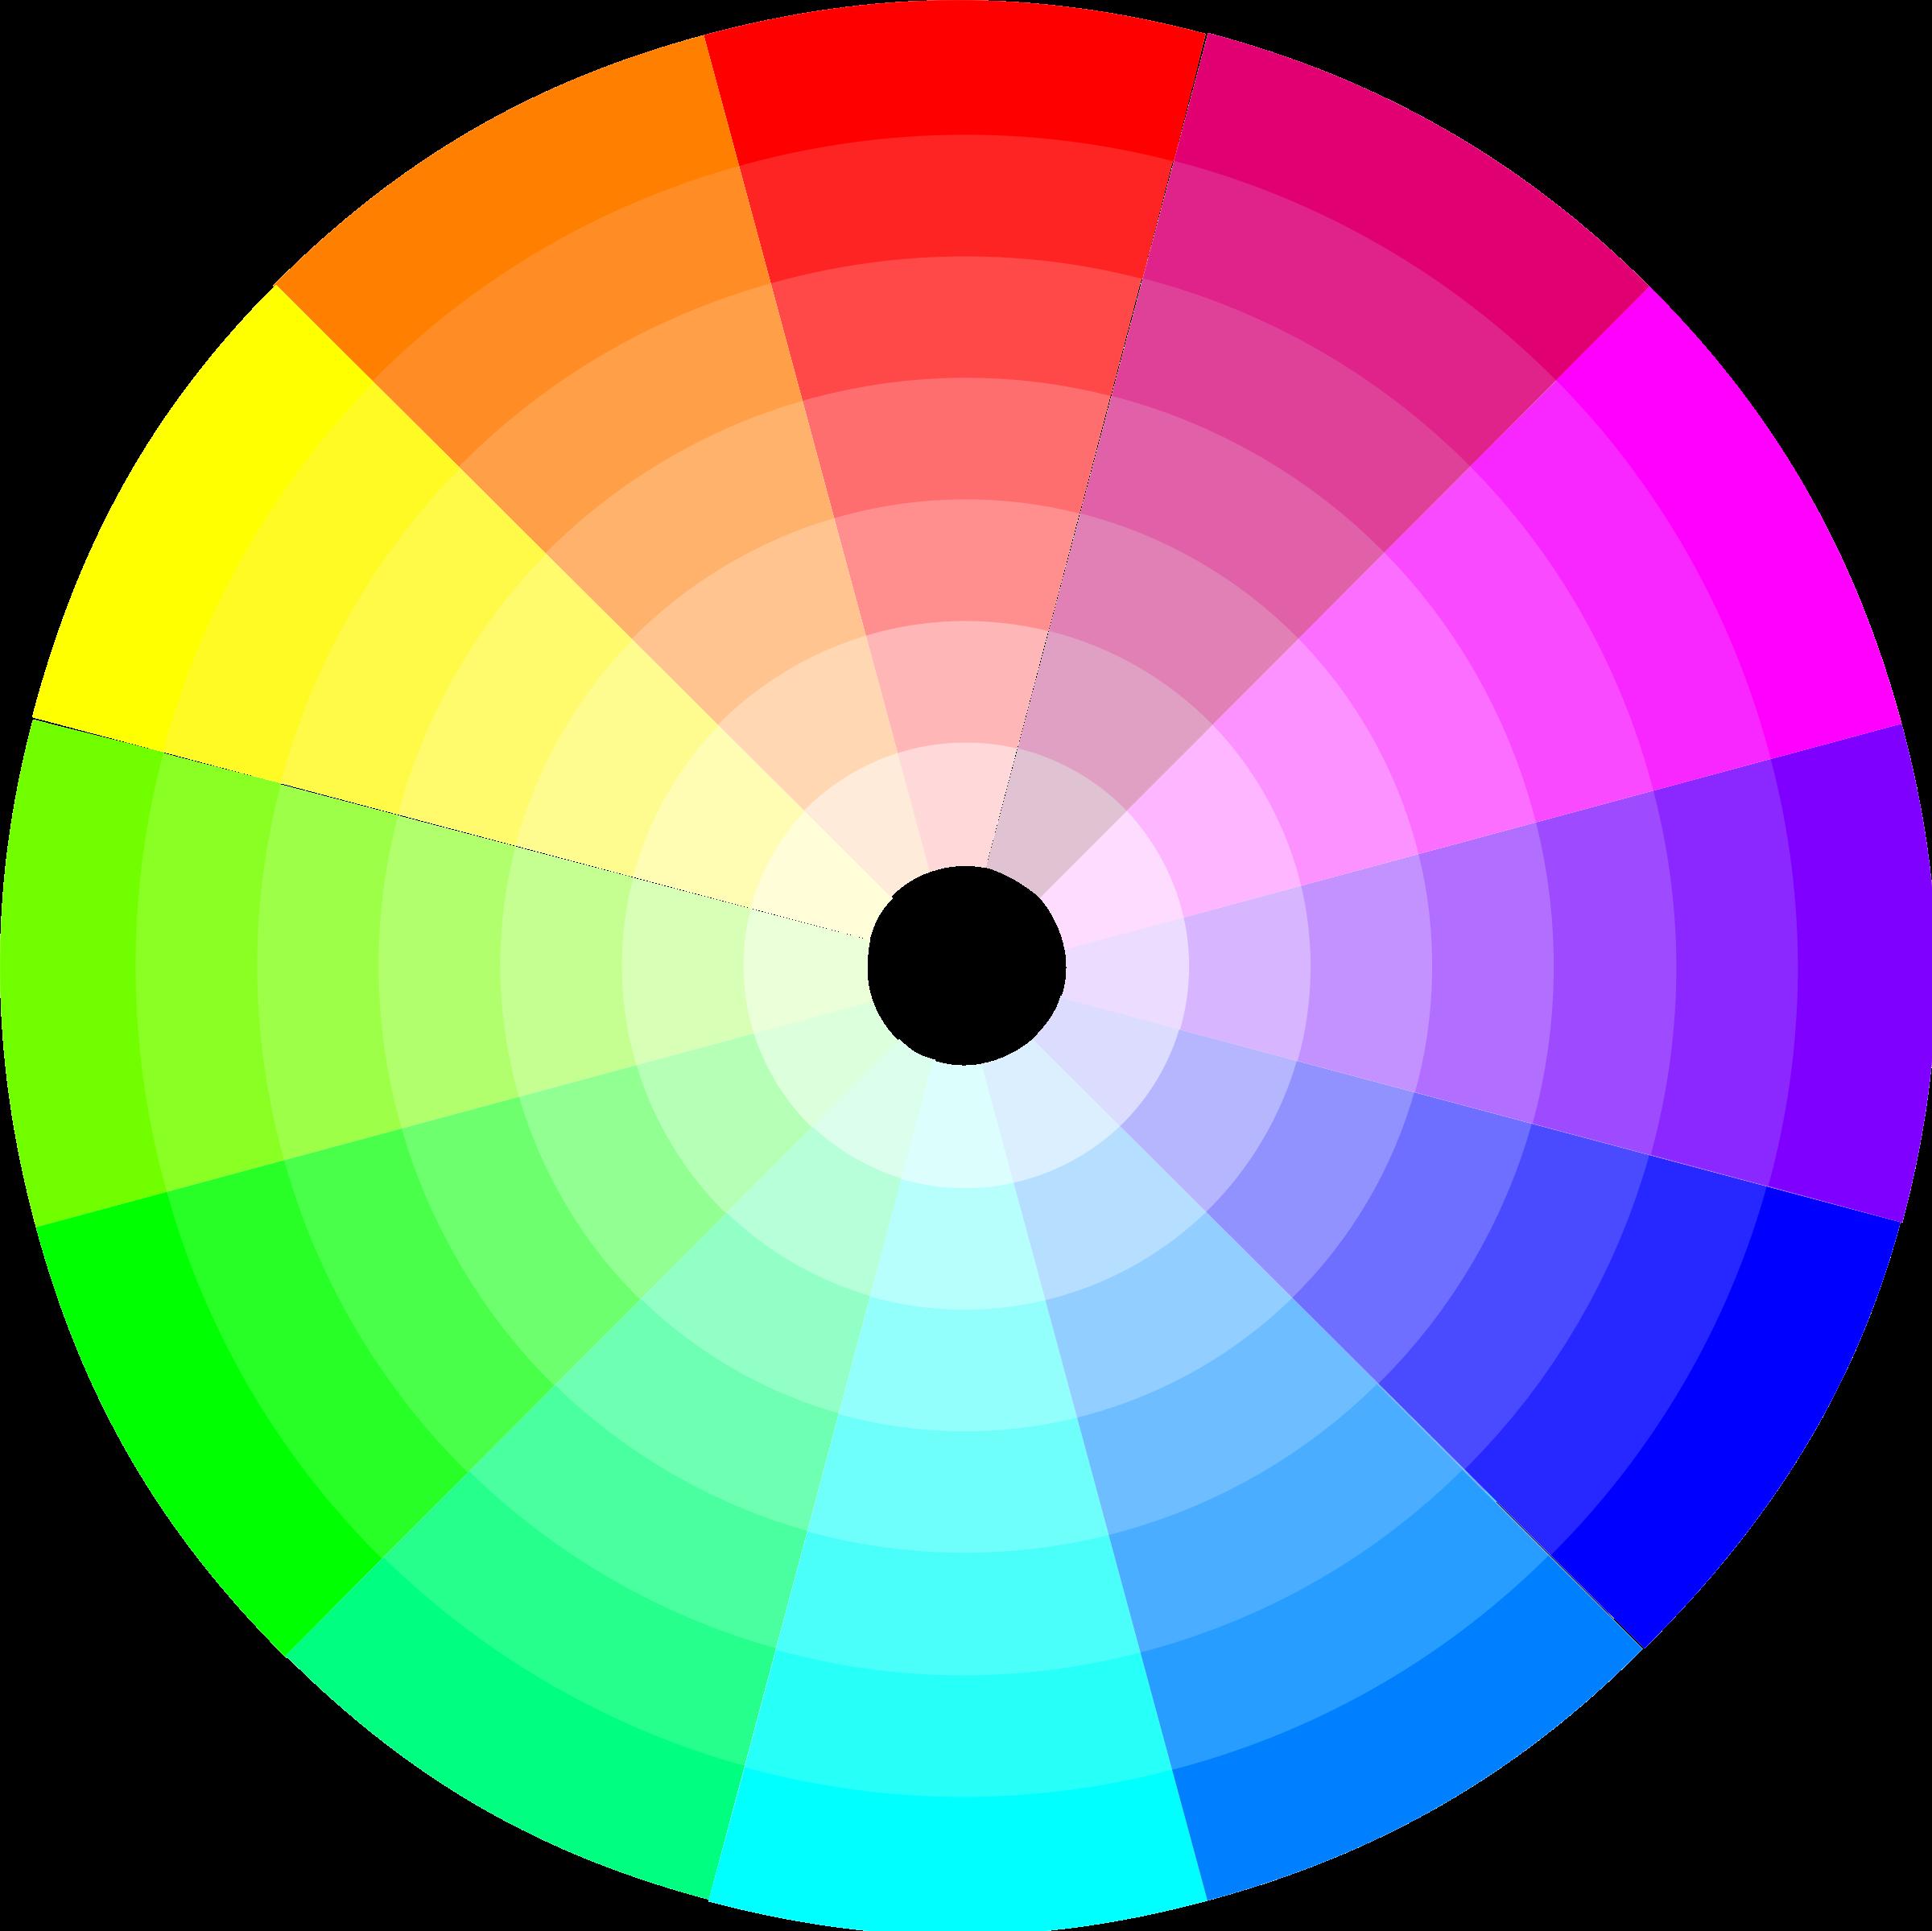 Free clipart colors vector transparent stock Color Wheel Vector Clipart image - Free stock photo - Public Domain ... vector transparent stock